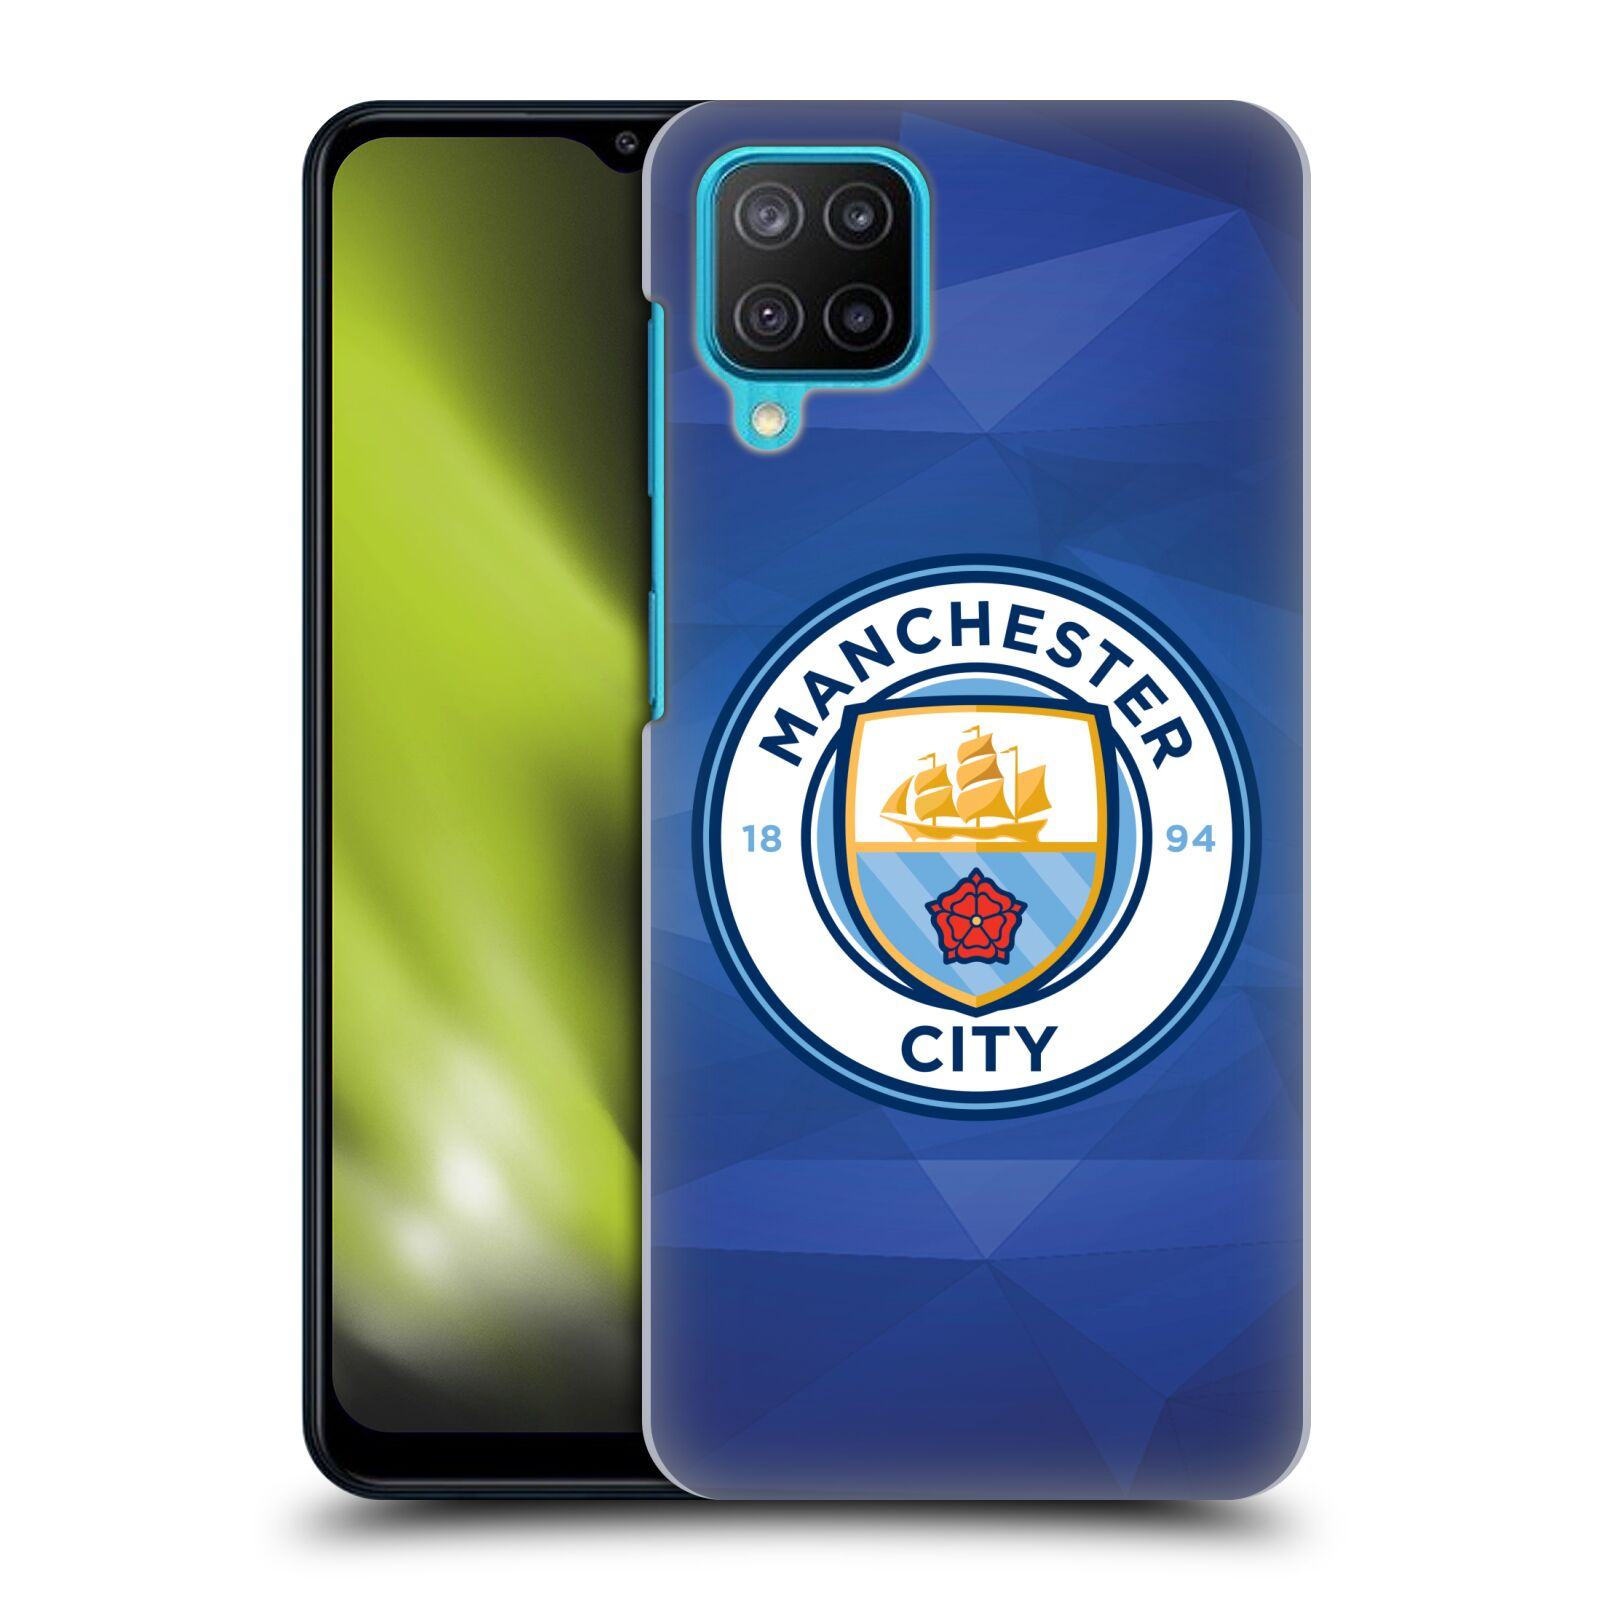 Plastové pouzdro na mobil Samsung Galaxy M12 - Head Case - Manchester City FC - Modré nové logo